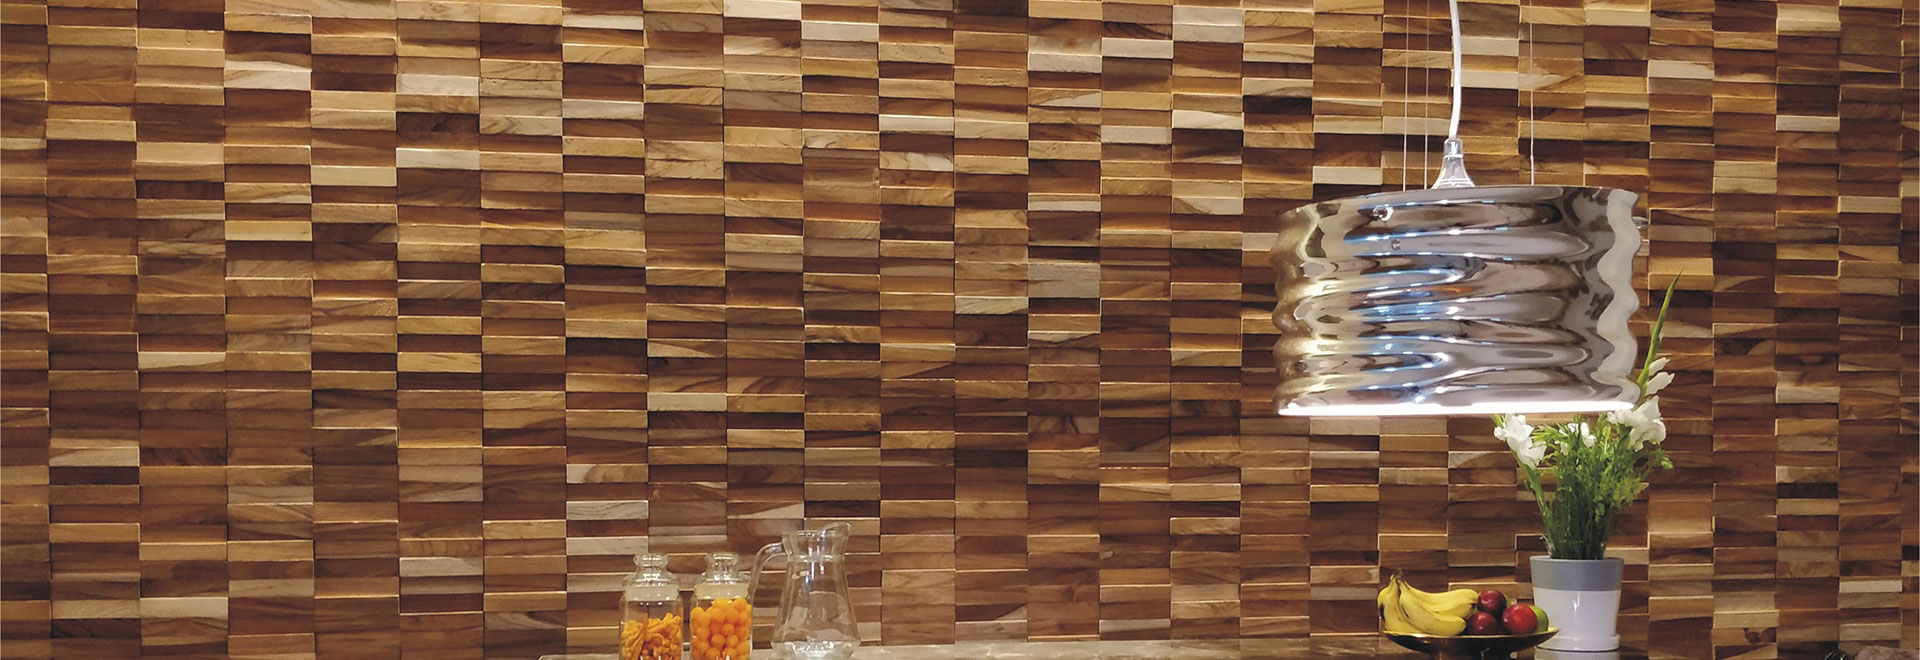 Teak Wood Wall Paneling